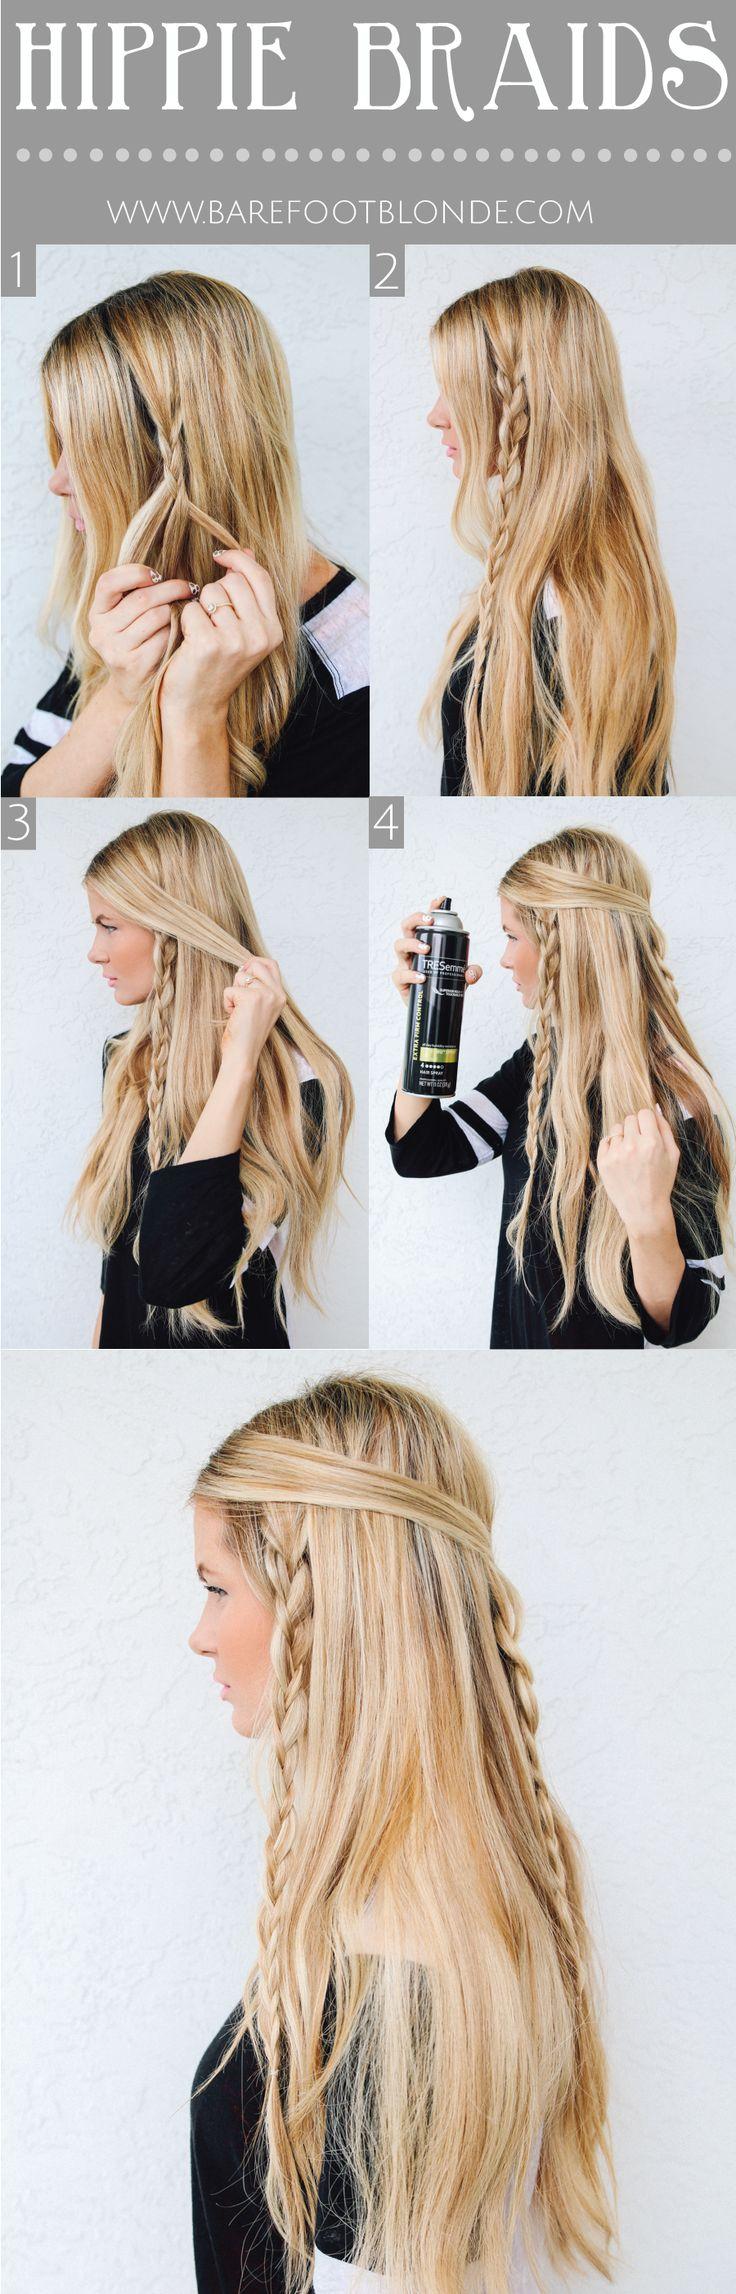 Pin by ferne currie on hair beauty pinterest hair hair styles